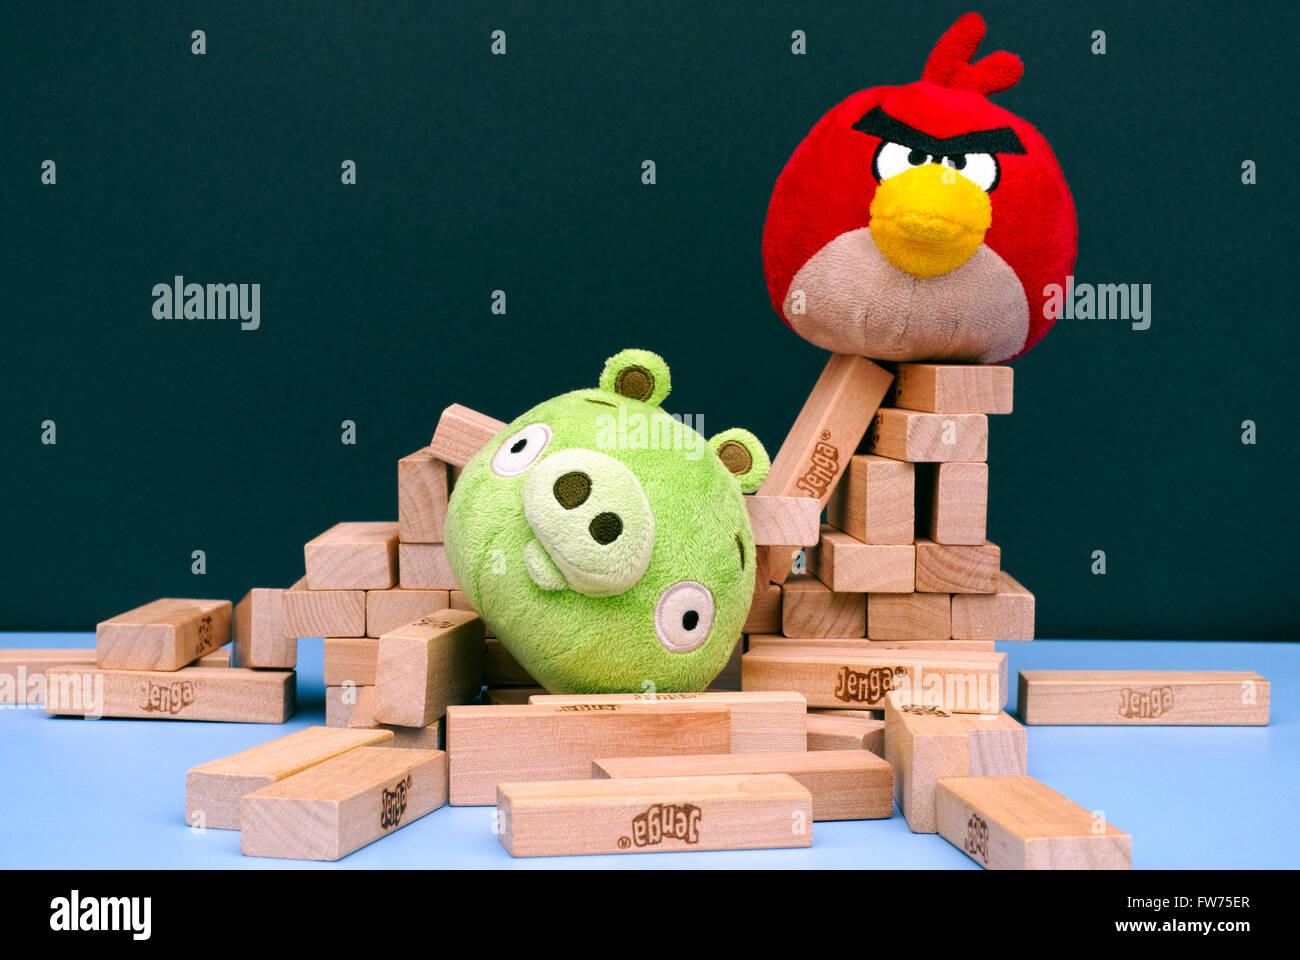 Angry Bird vs. Bad Piggies. Red bird broke bad pig's house. Bad piggy lying in pile of Jenga bricks which its house - Stock Image